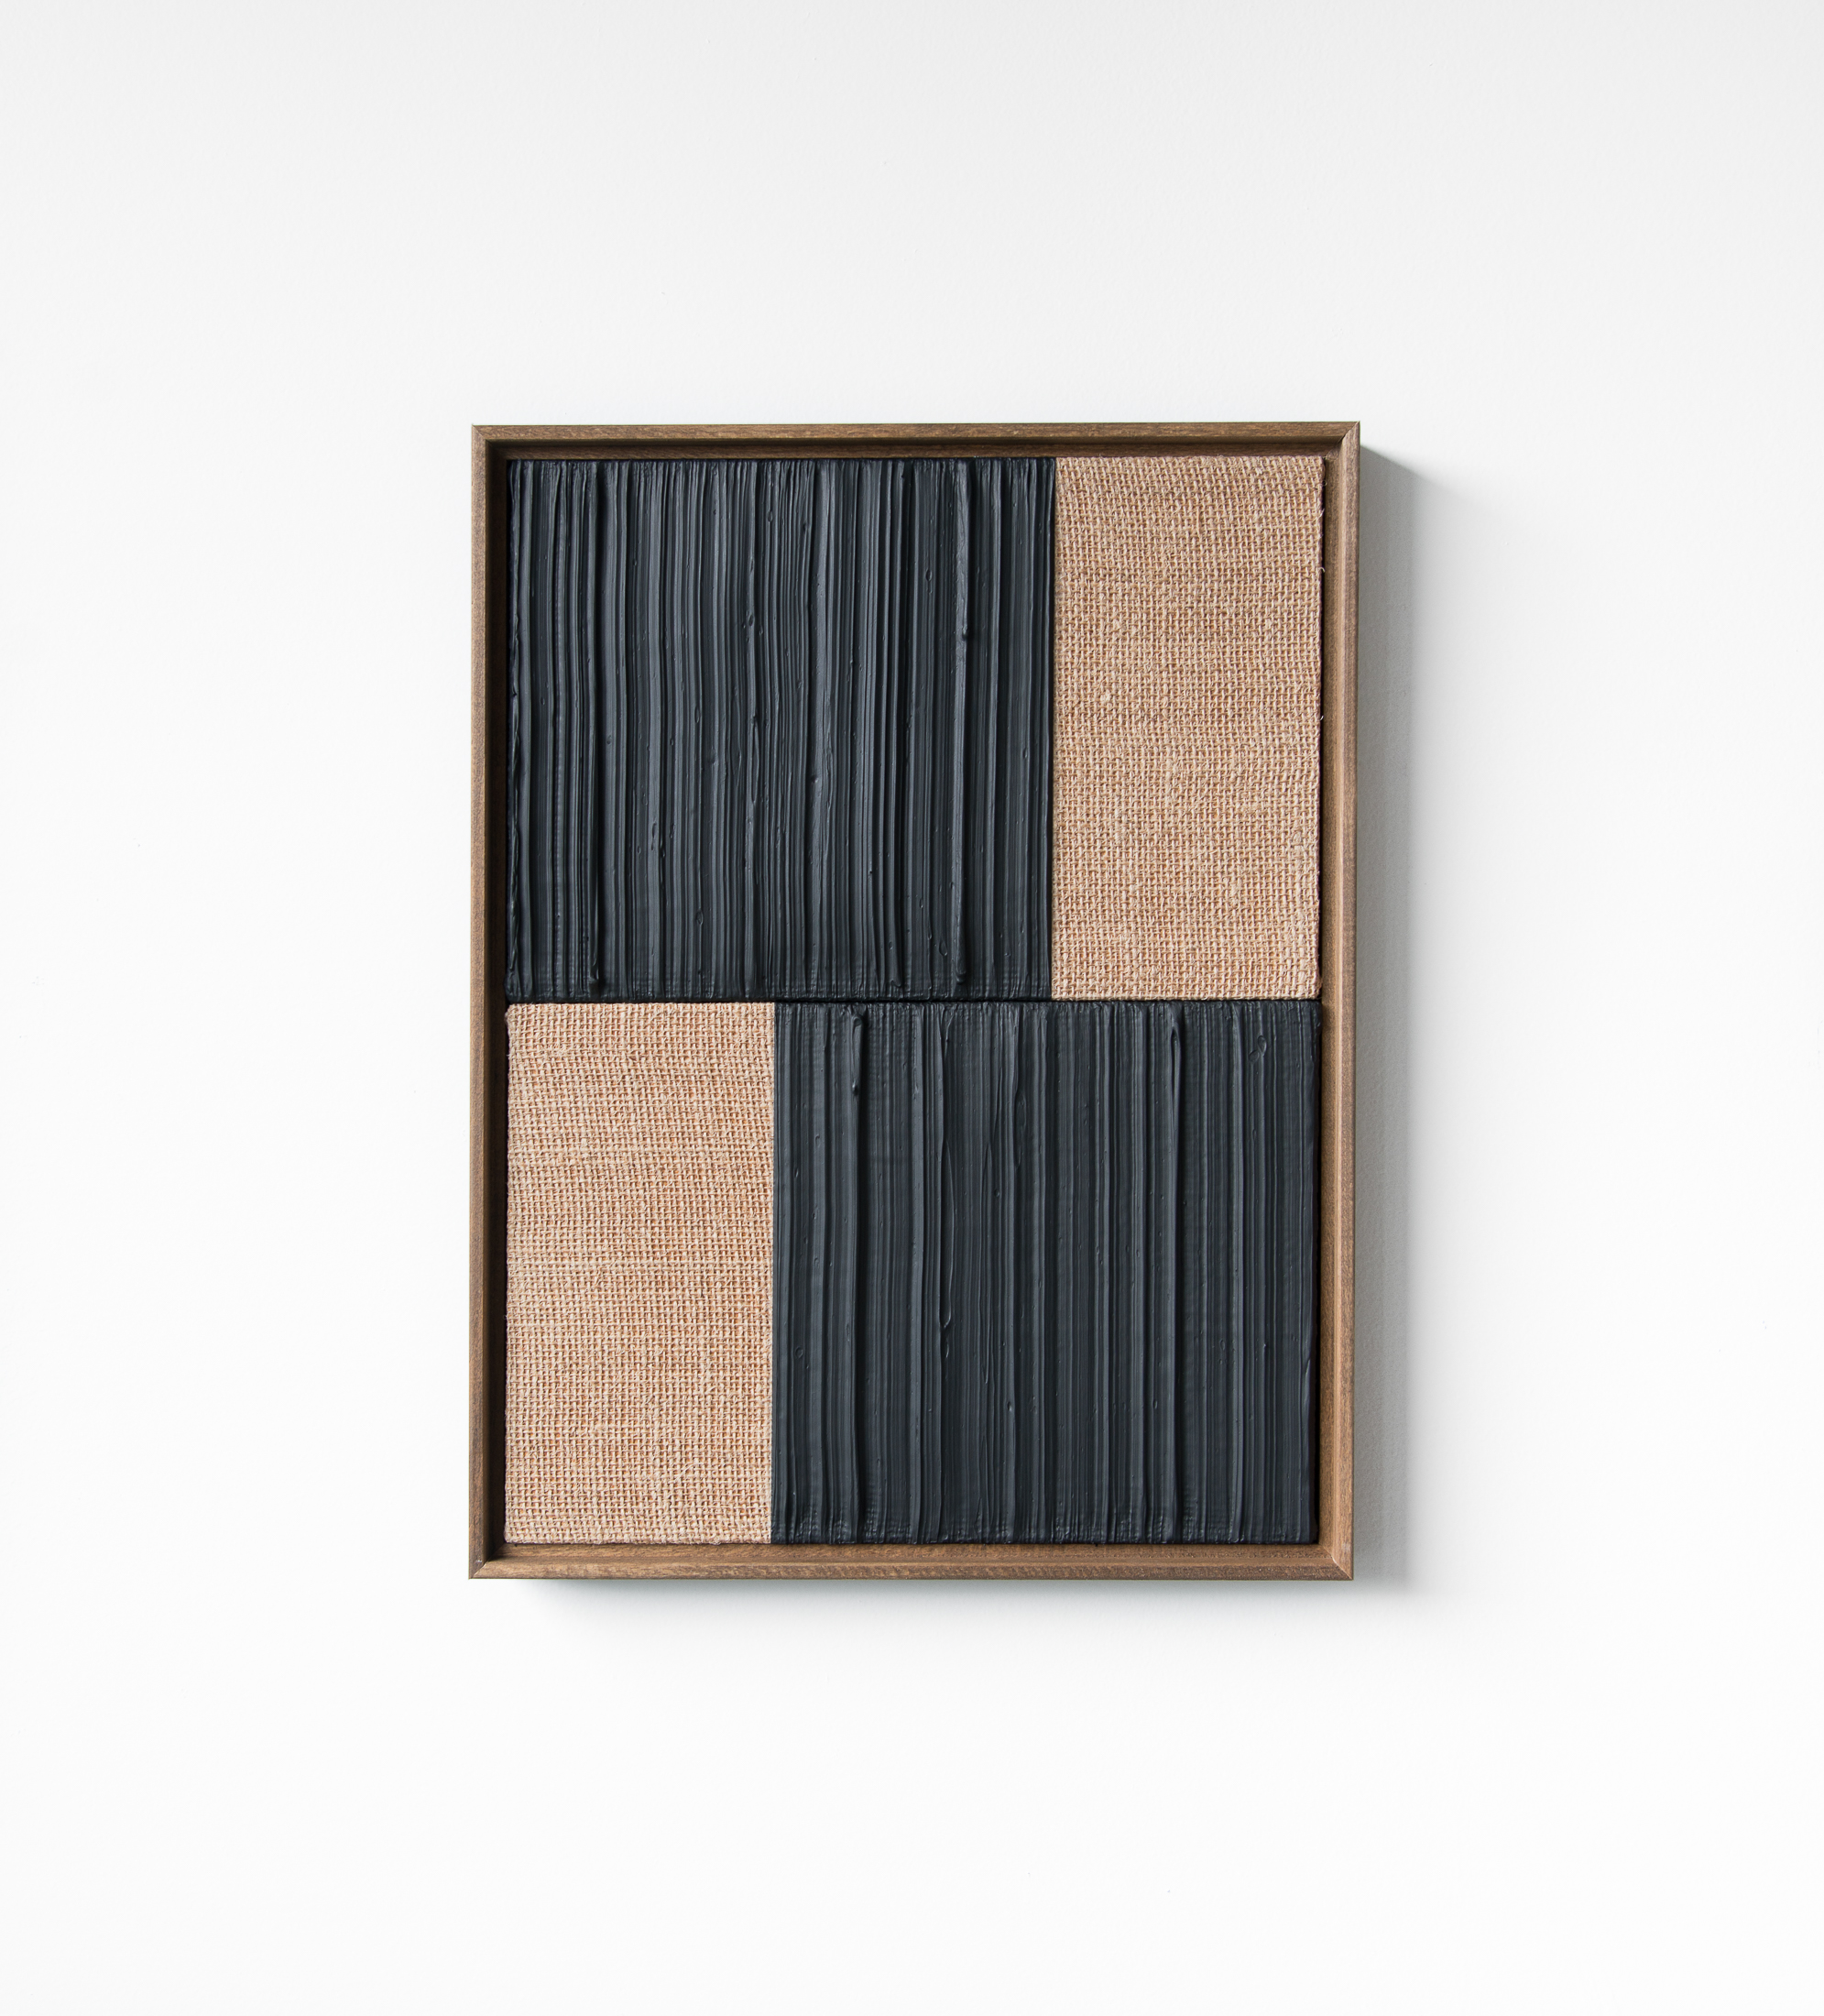 Johnny Abrahams Black-Black Acrylic on burlap over panel 2021 - 13x17 inches